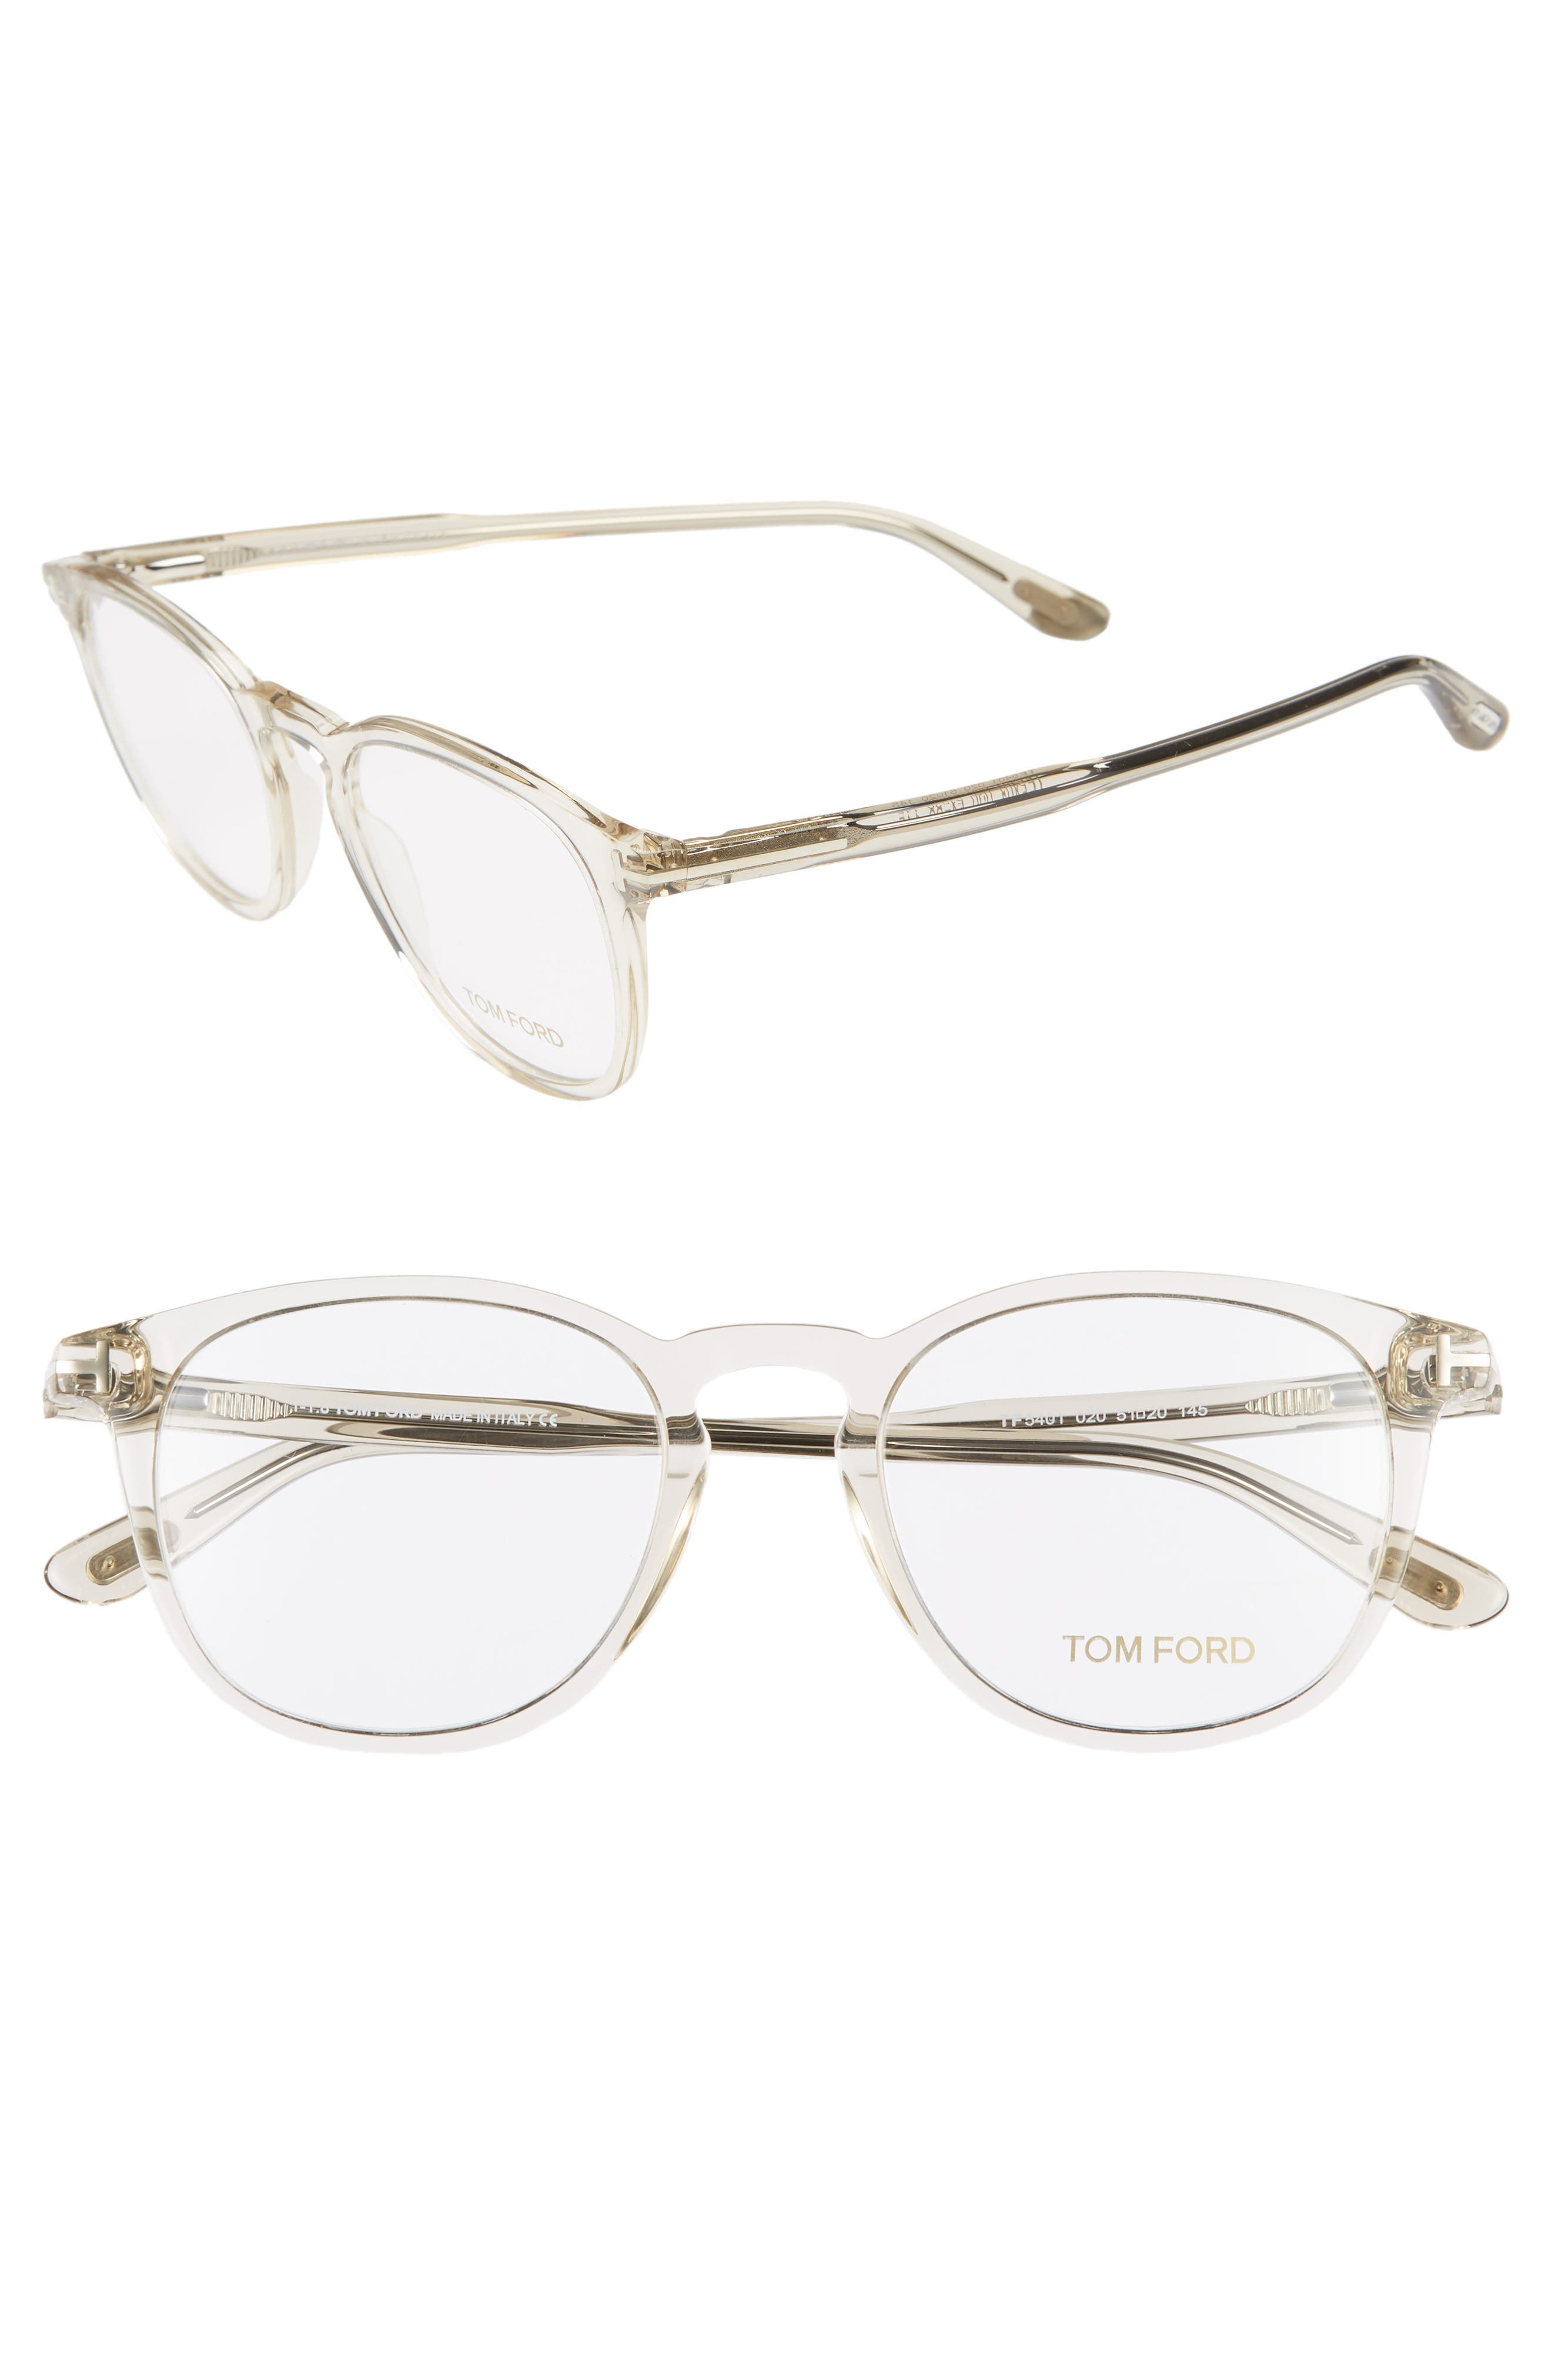 51mm Round Optical Glasses,                         Main,                         color, SHINY TRANSPARENT GREY